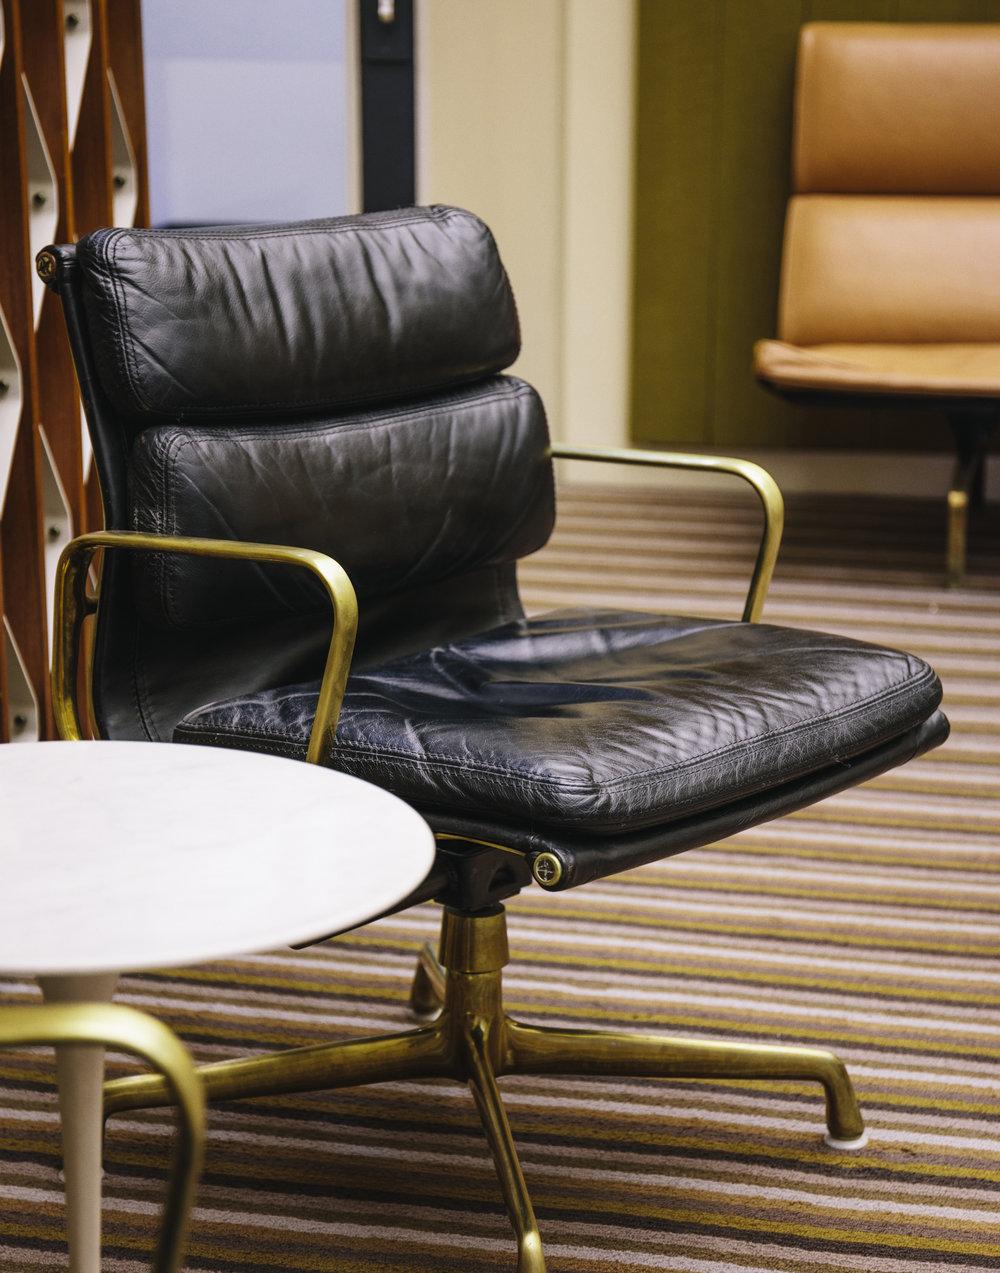 Irwin Miller's custom Eames chair